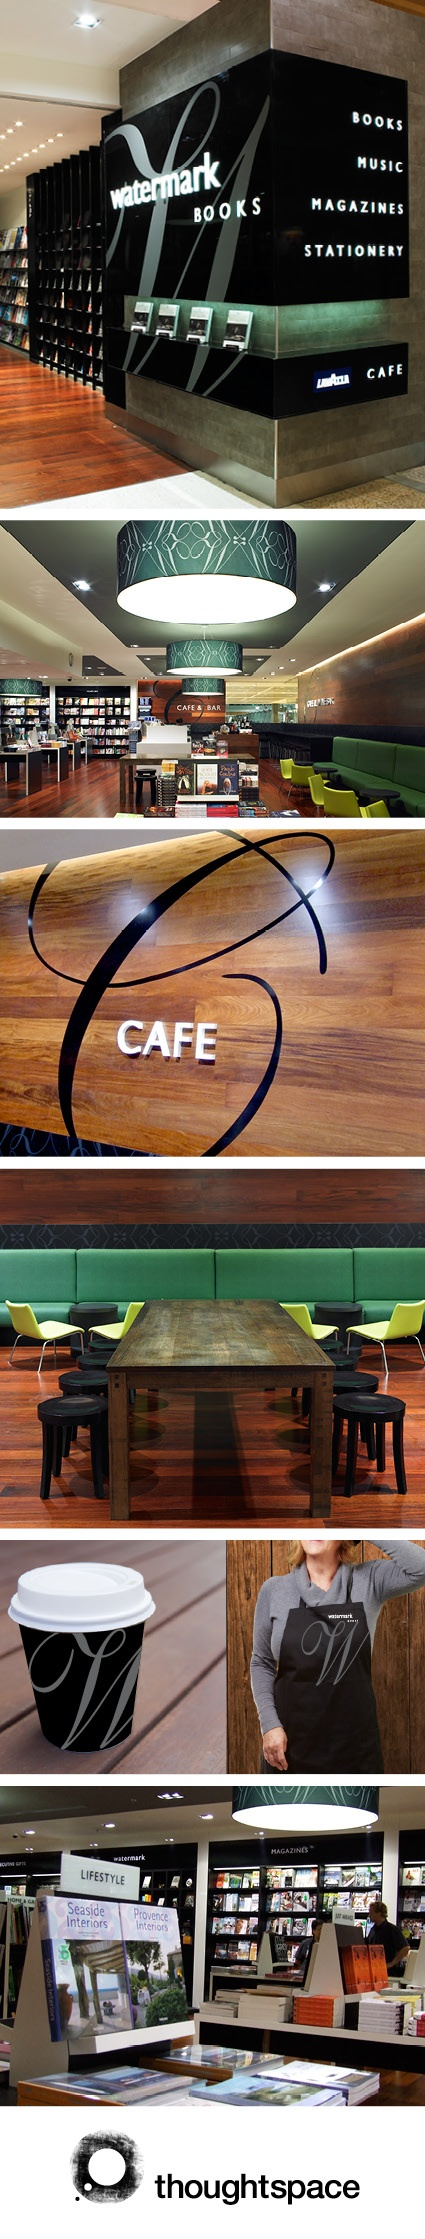 Retail Interior Design, Graphics & Signage Design. Watermark Books.  www.thoughtspace.com.au